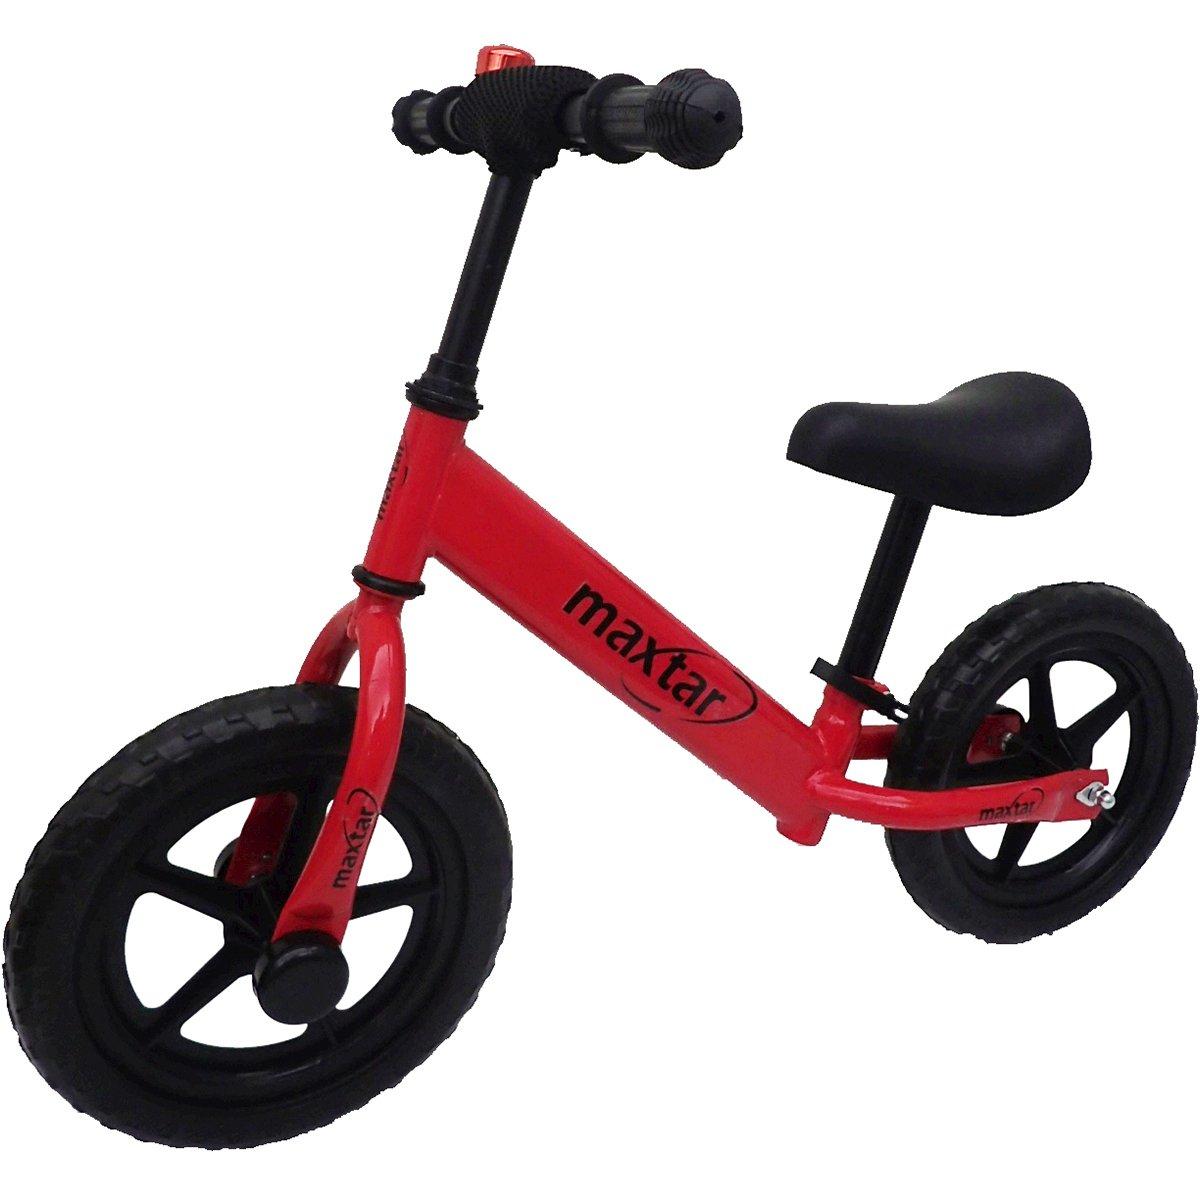 Bicicleta fara pedale Maxtar Sebra, Rosu, 12 inch